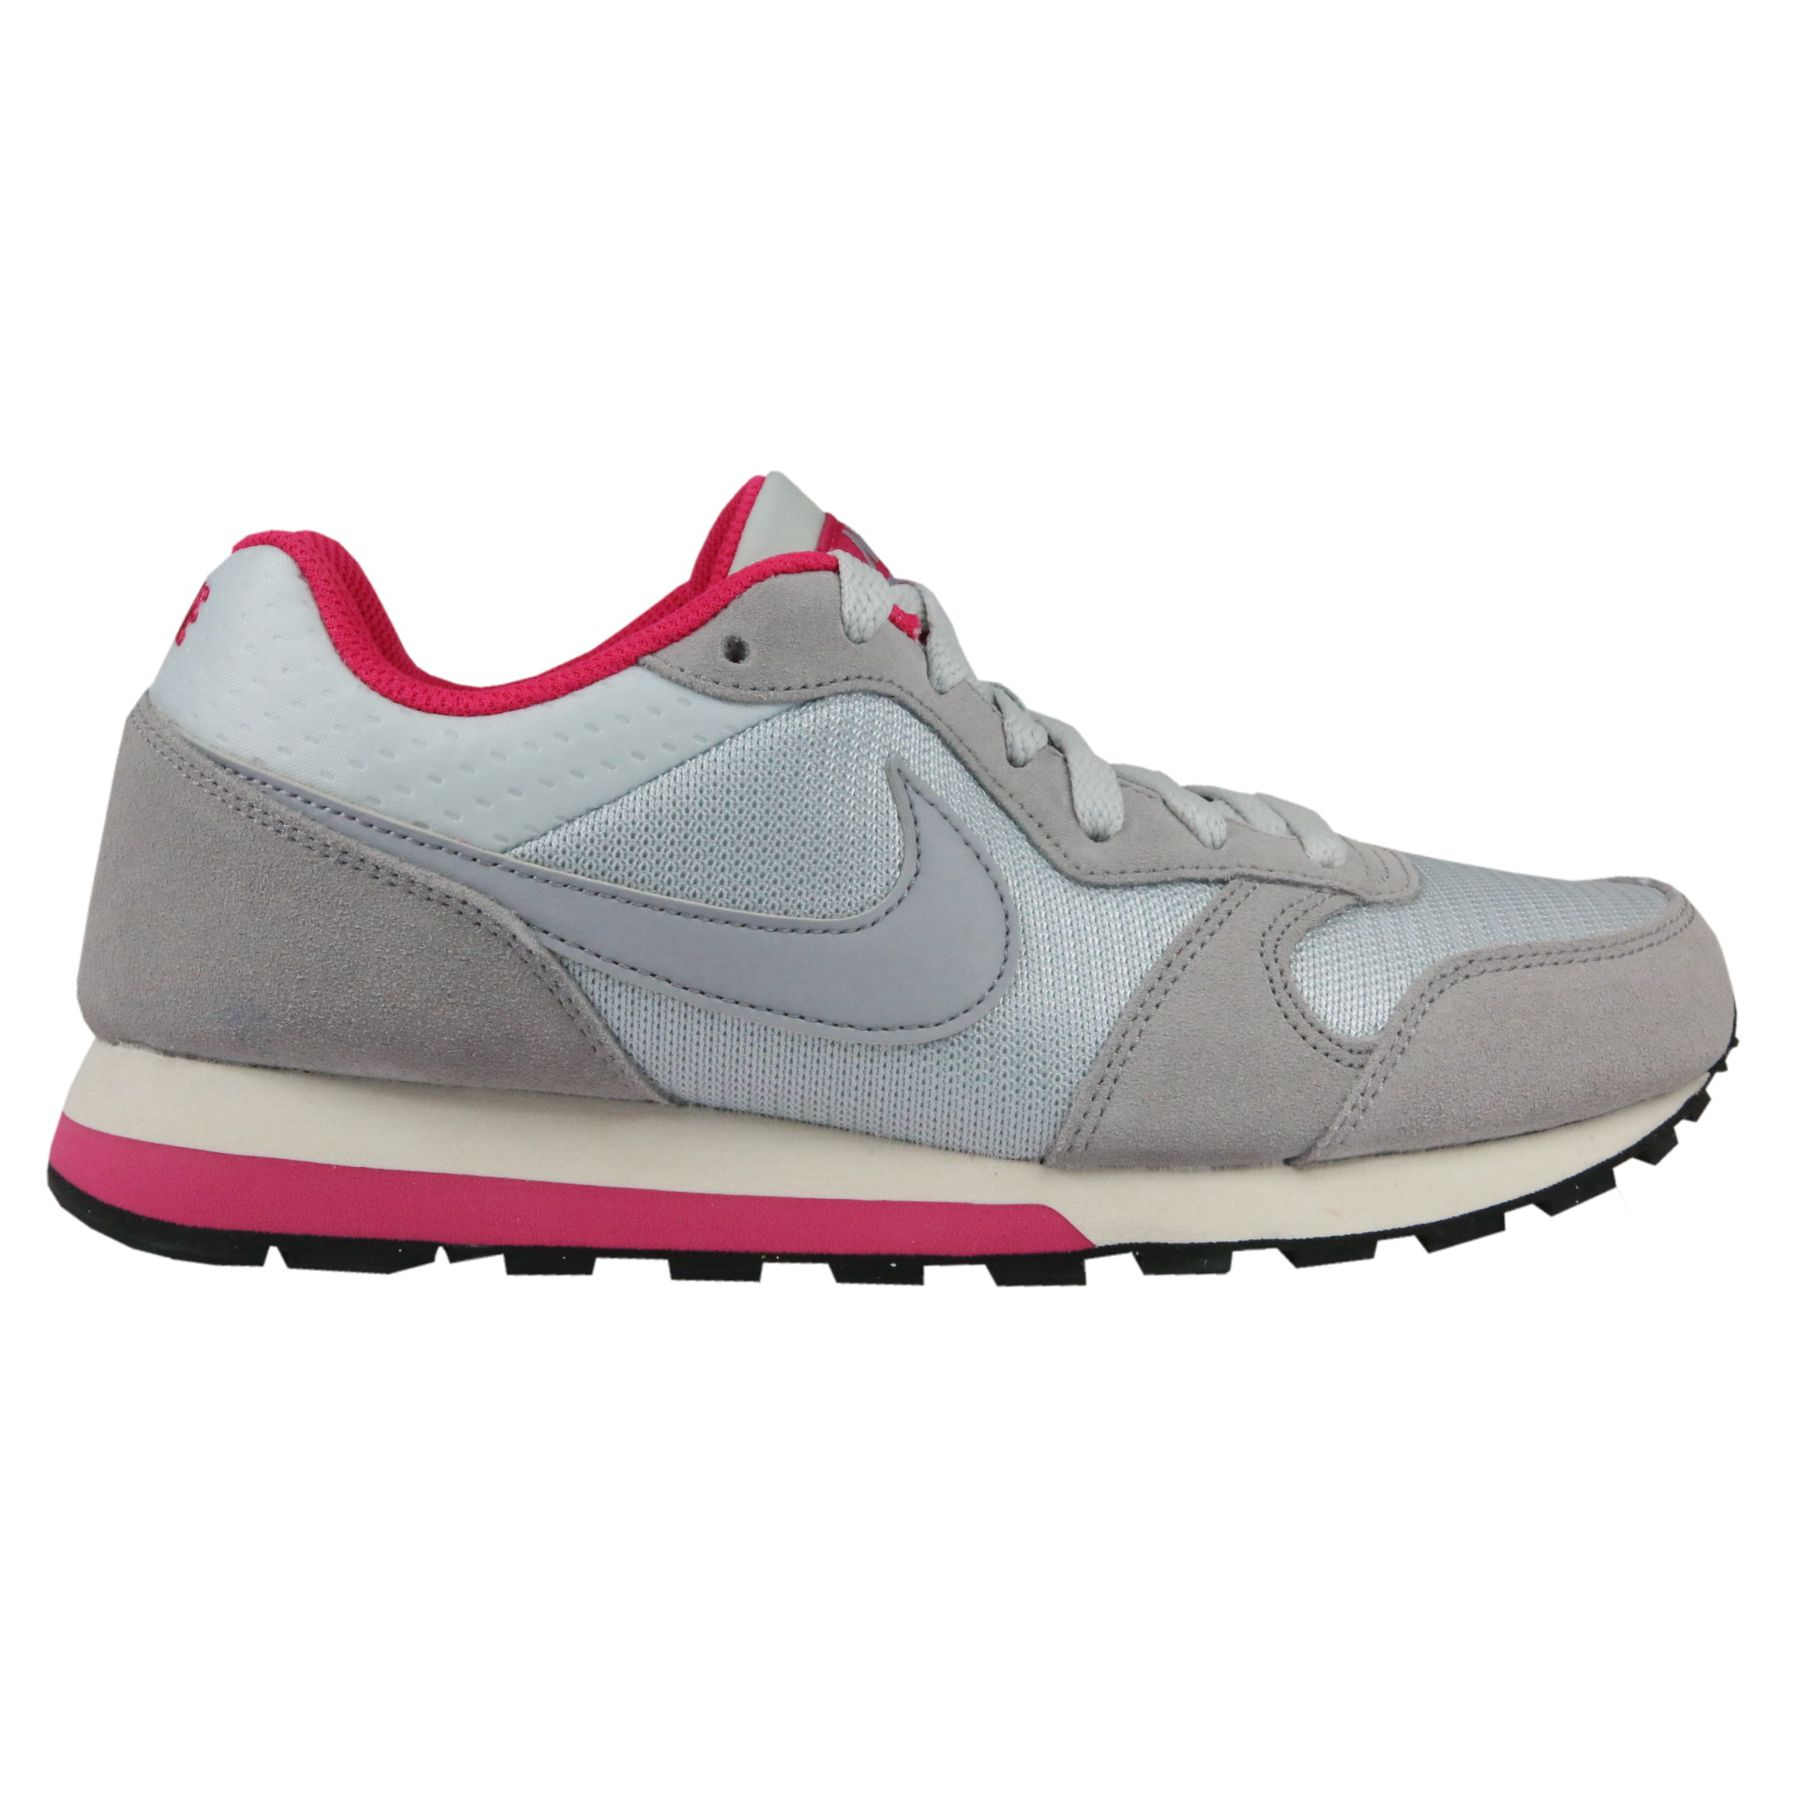 nike md runner 2 schuhe turnschuhe sneaker damen 749869 ebay